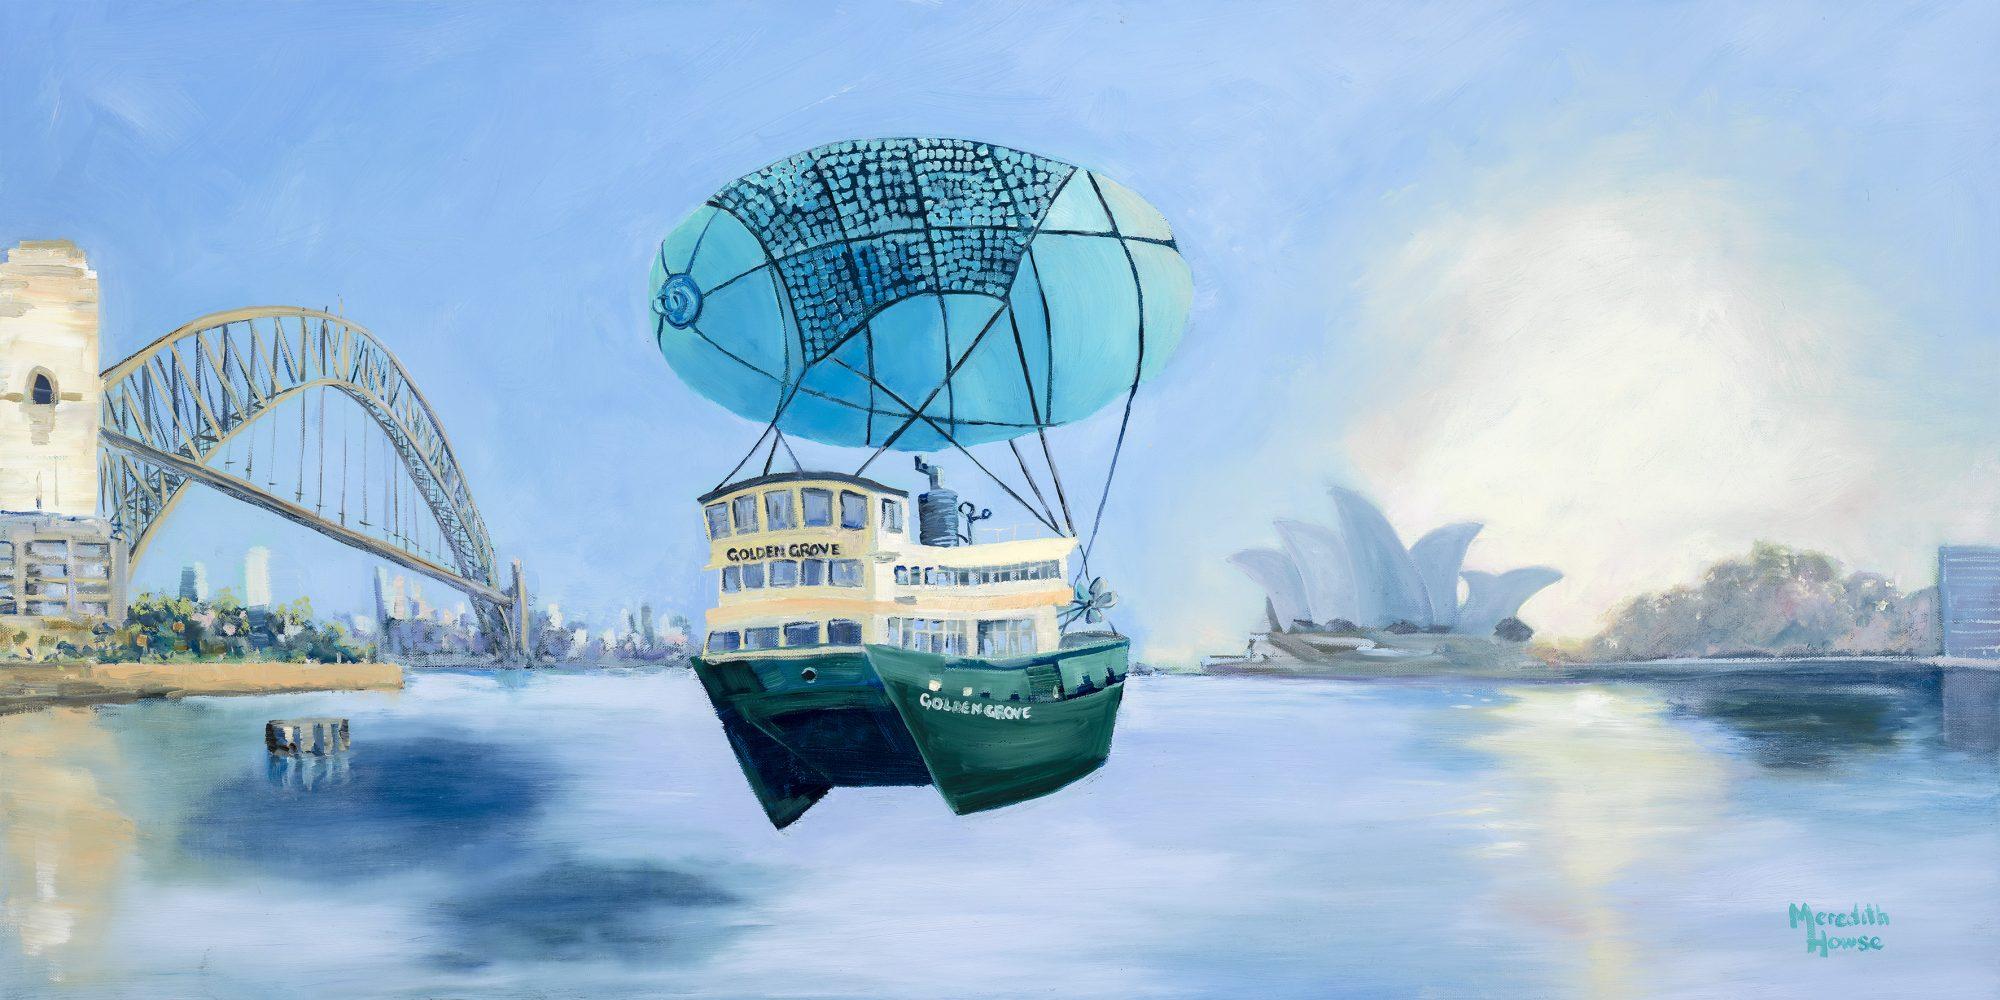 Meredith Howse 069 Sydney Harbour Seaworthy 30cm Promo